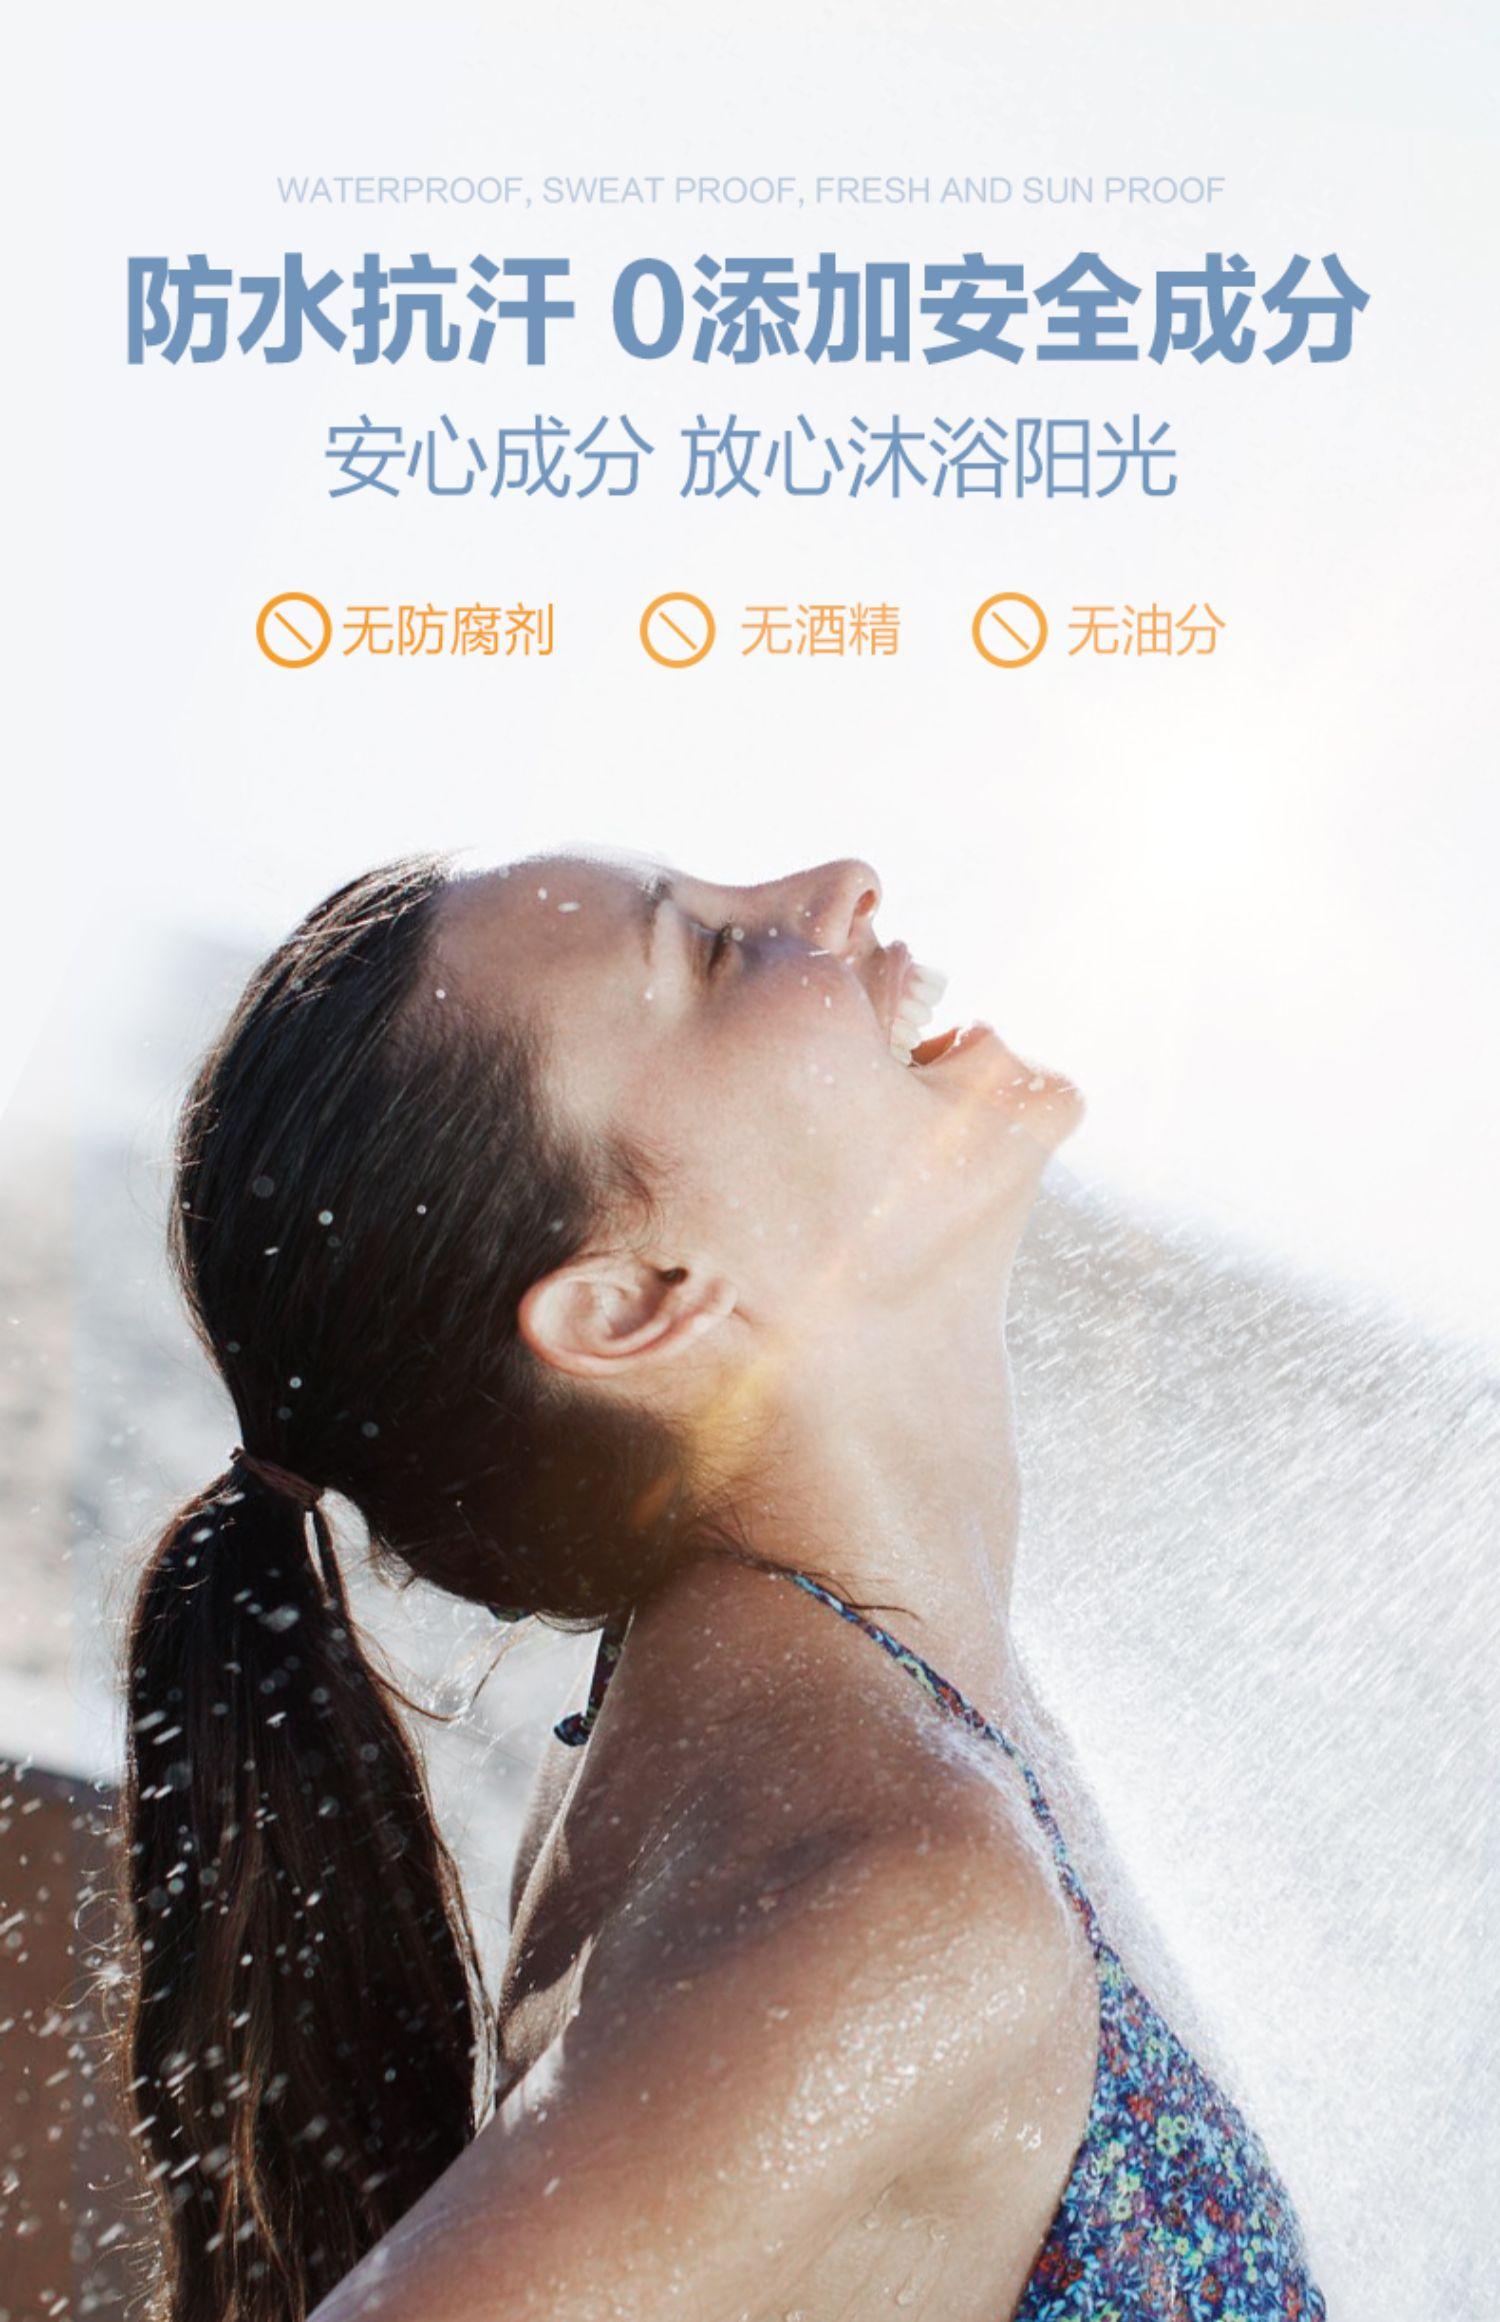 yuranm mt1清爽不油腻面部防晒霜10